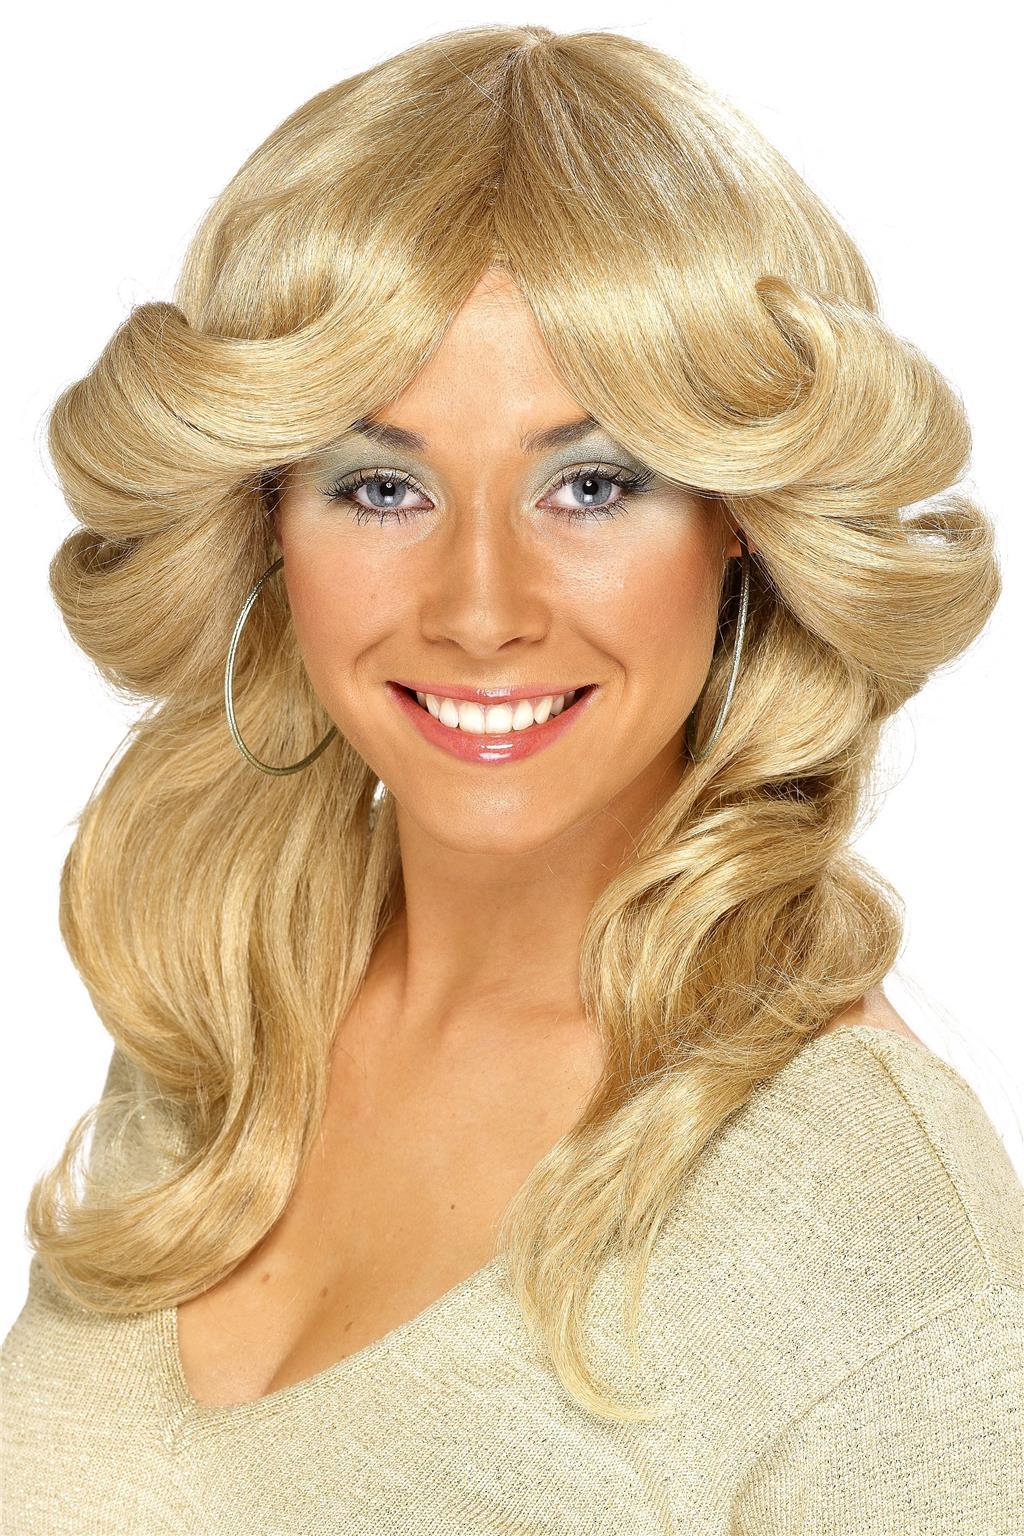 Disco Angel 1970s Farrah Fawcett Blonde Wavy Women Costume Wig